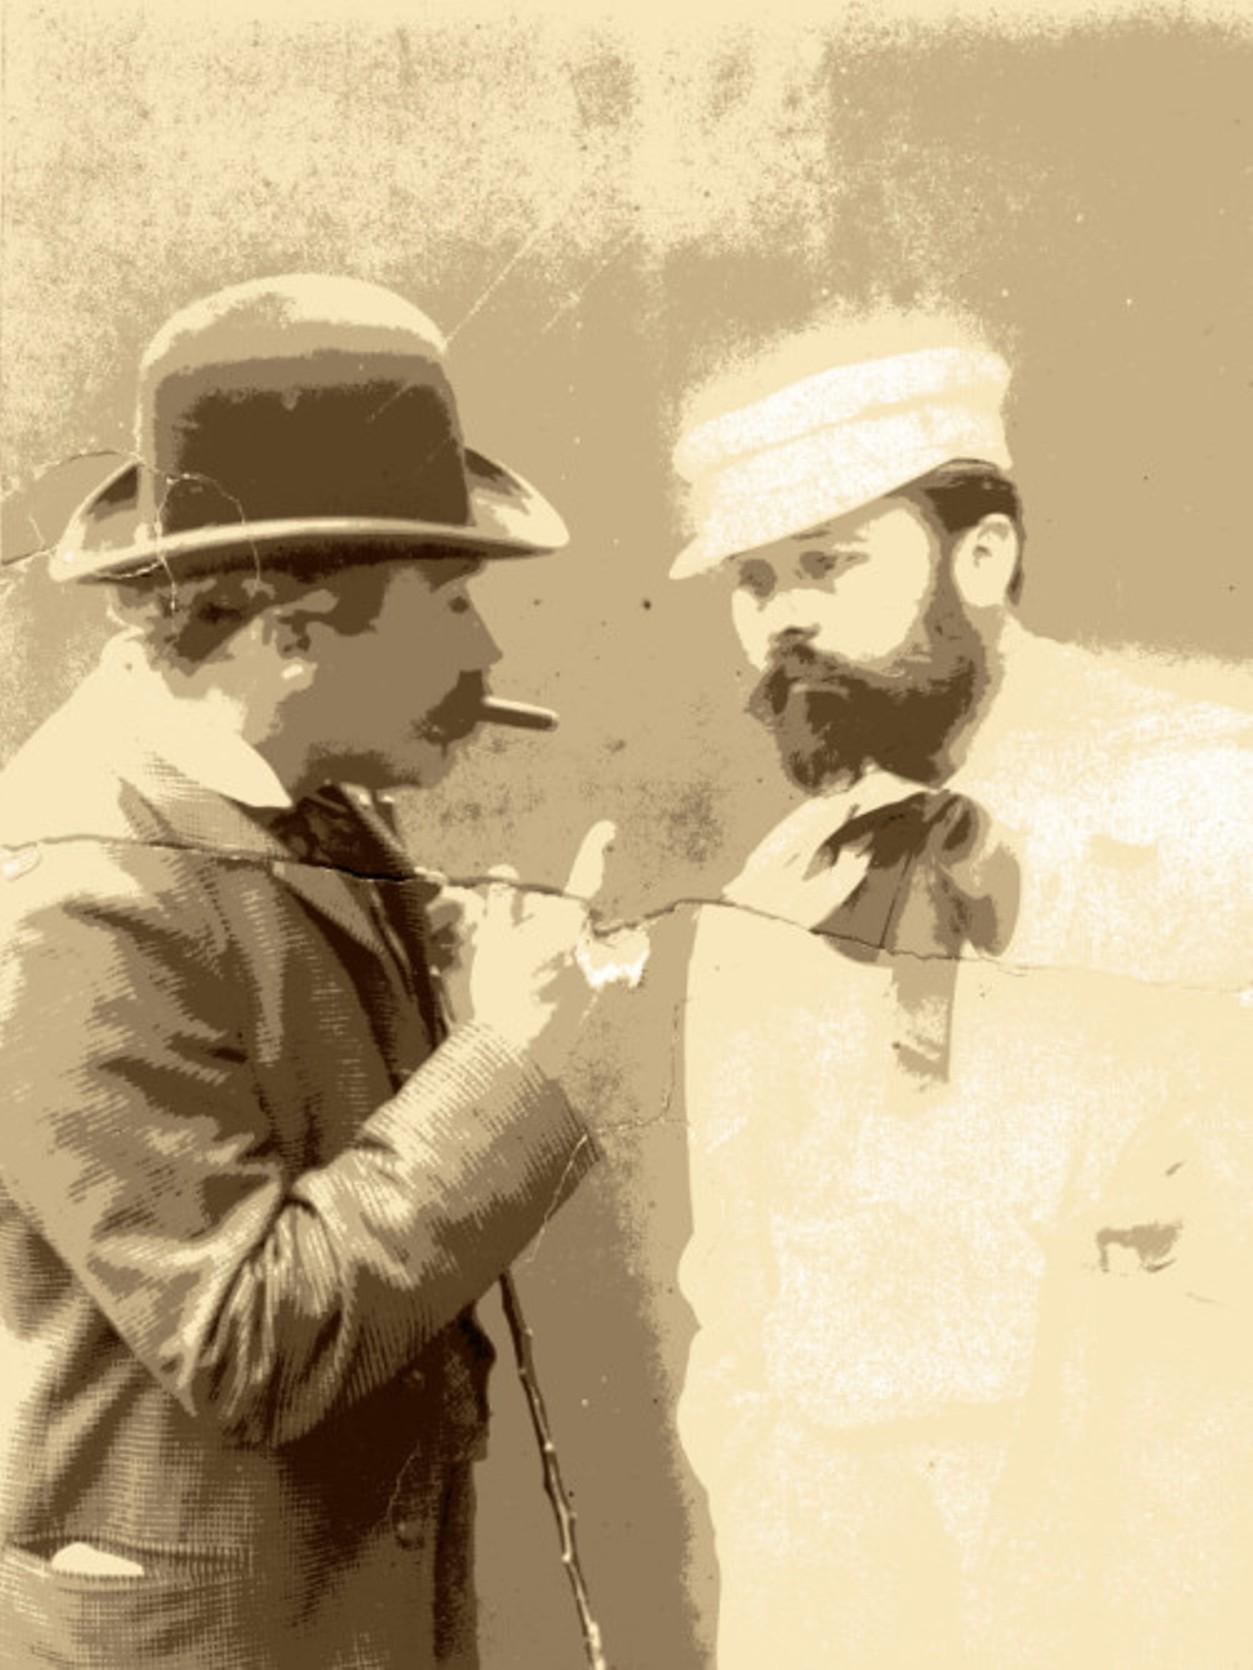 Image - Georges Charpentier et Fernand Desmoulin